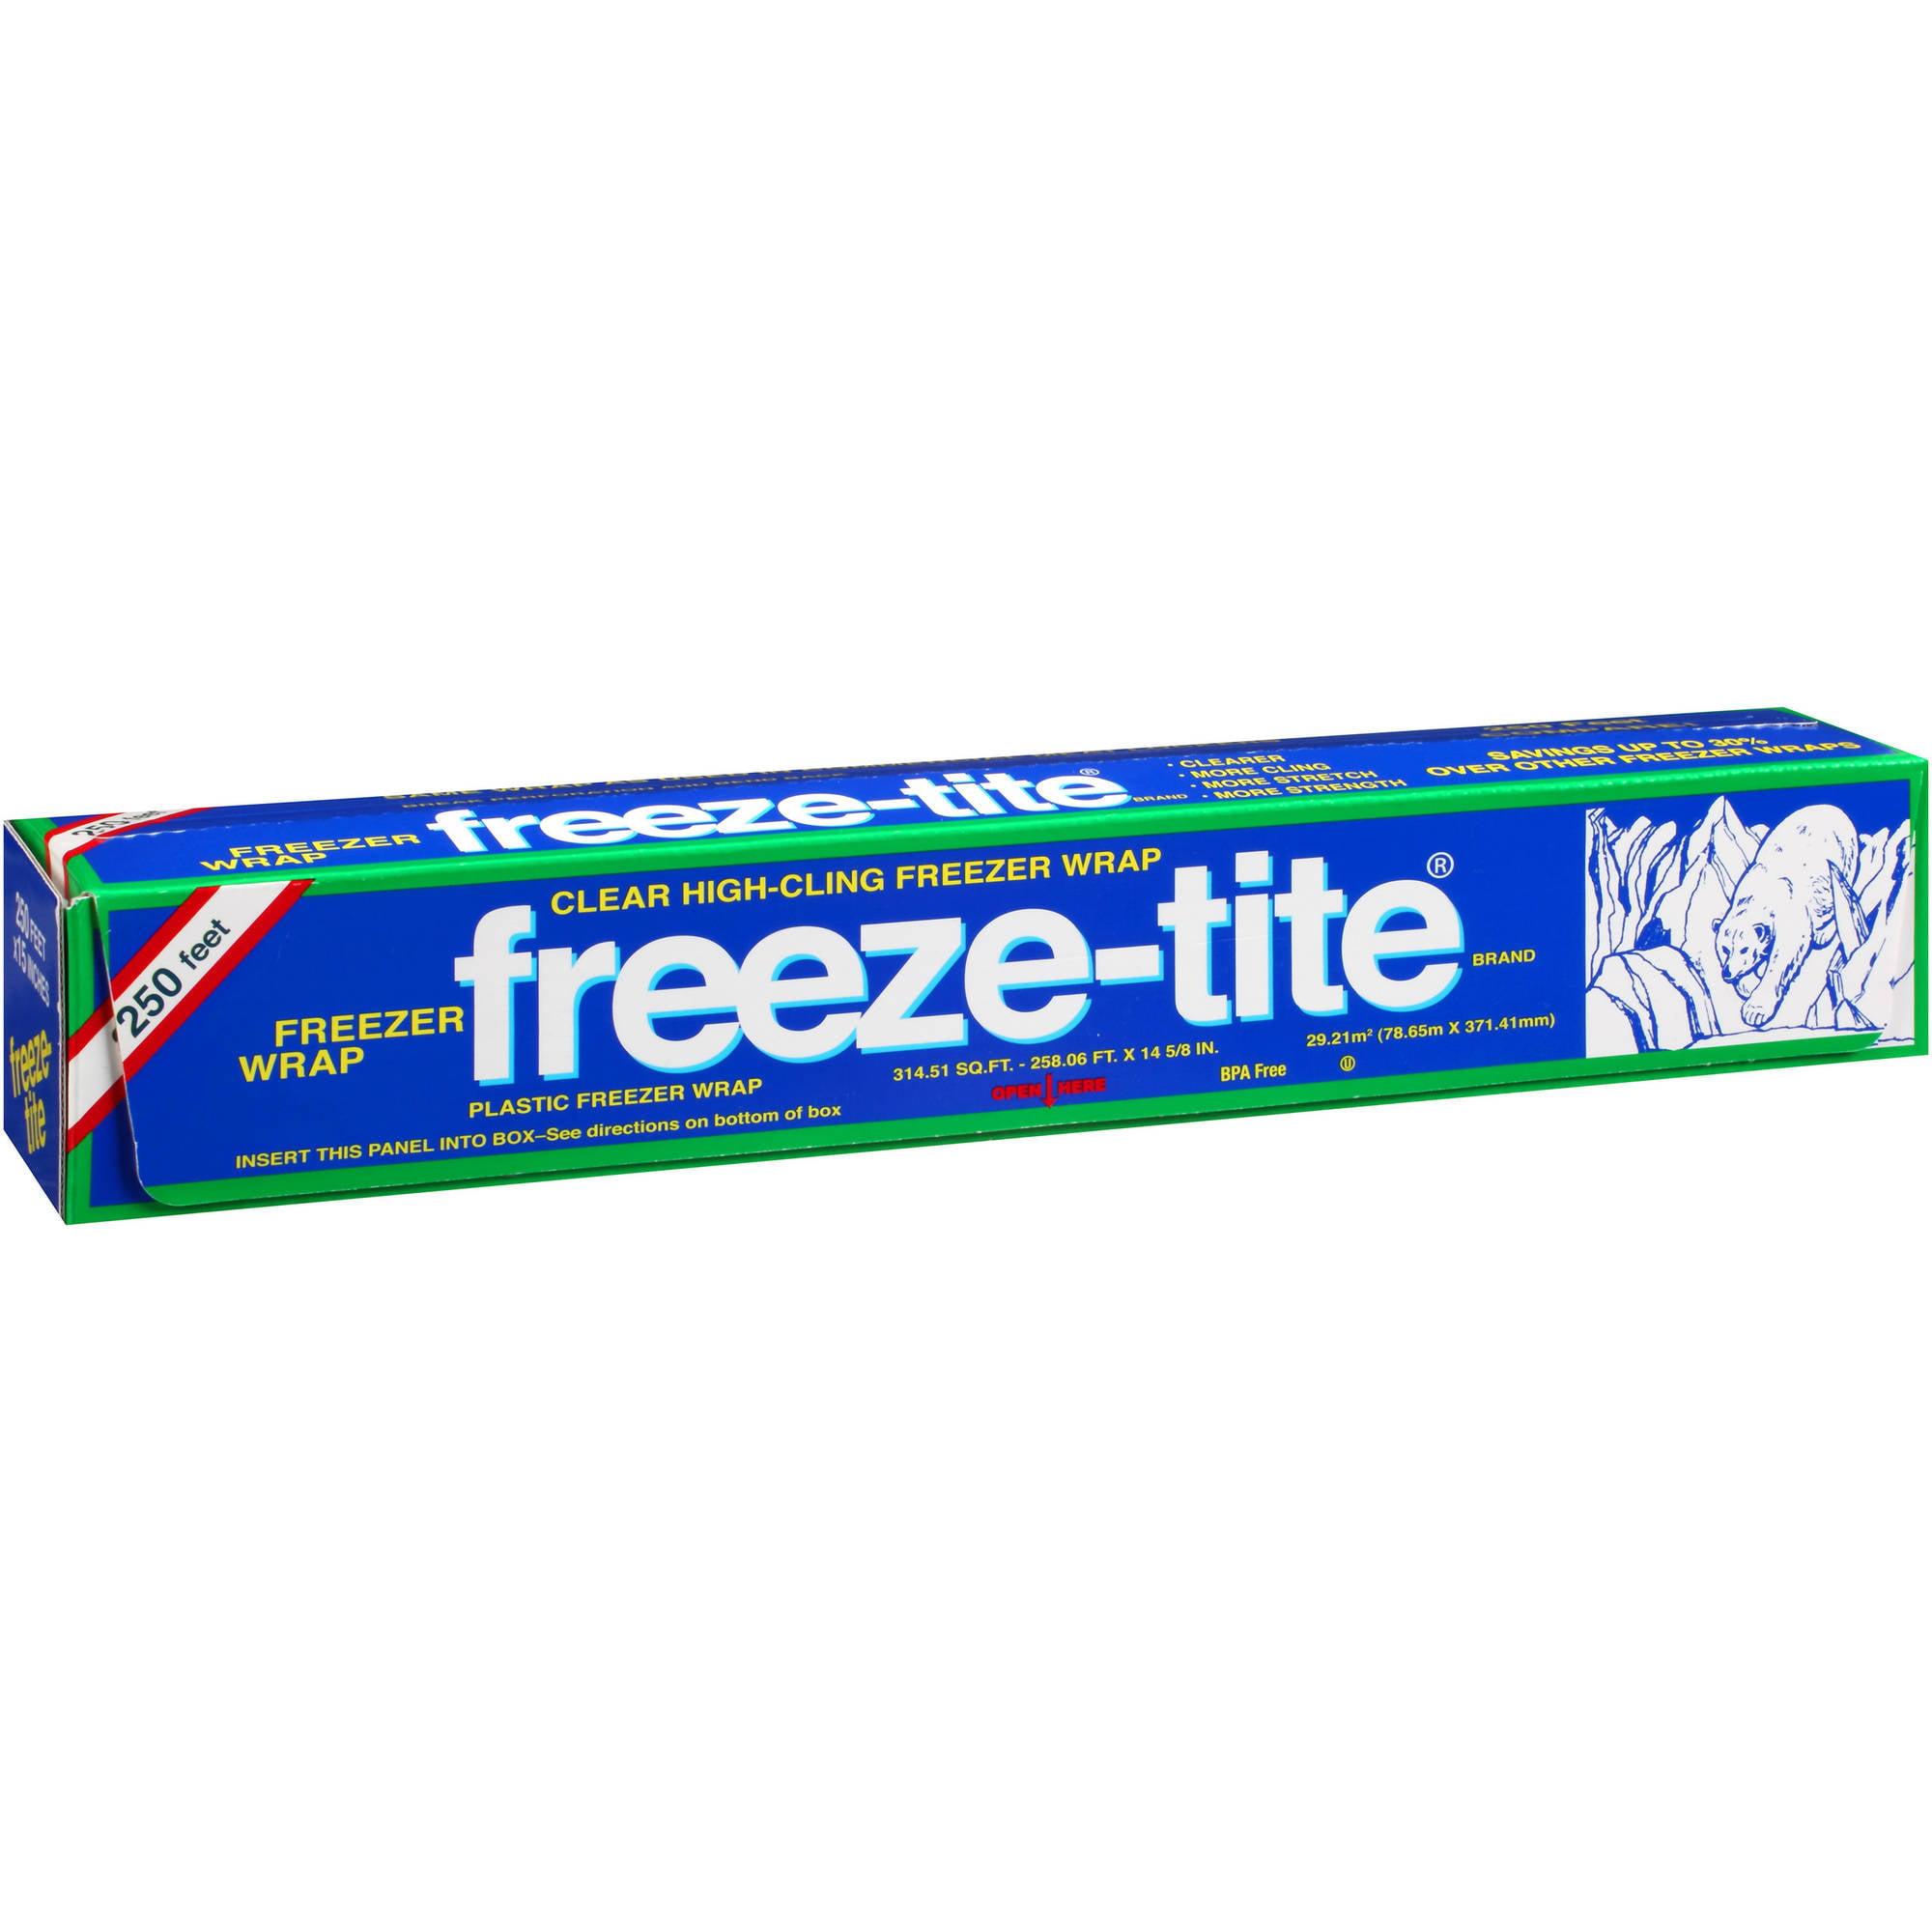 freeze-tite Plastic Freezer Wrap, 314.51 sq ft